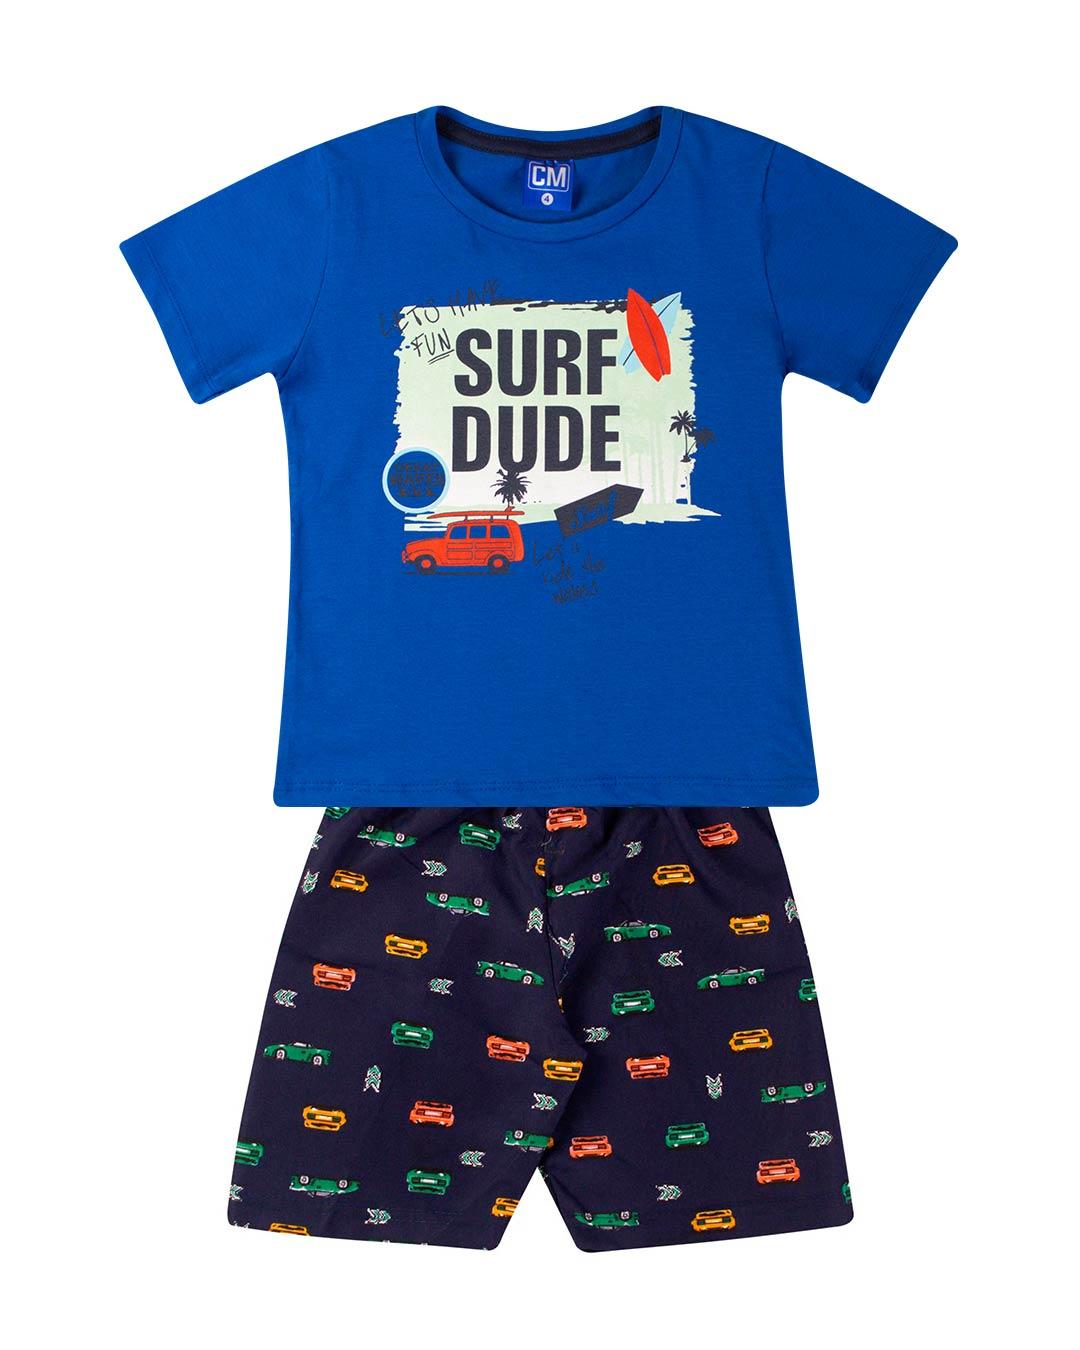 Conjunto Infantil Surf Dude Azul - Cara Metade